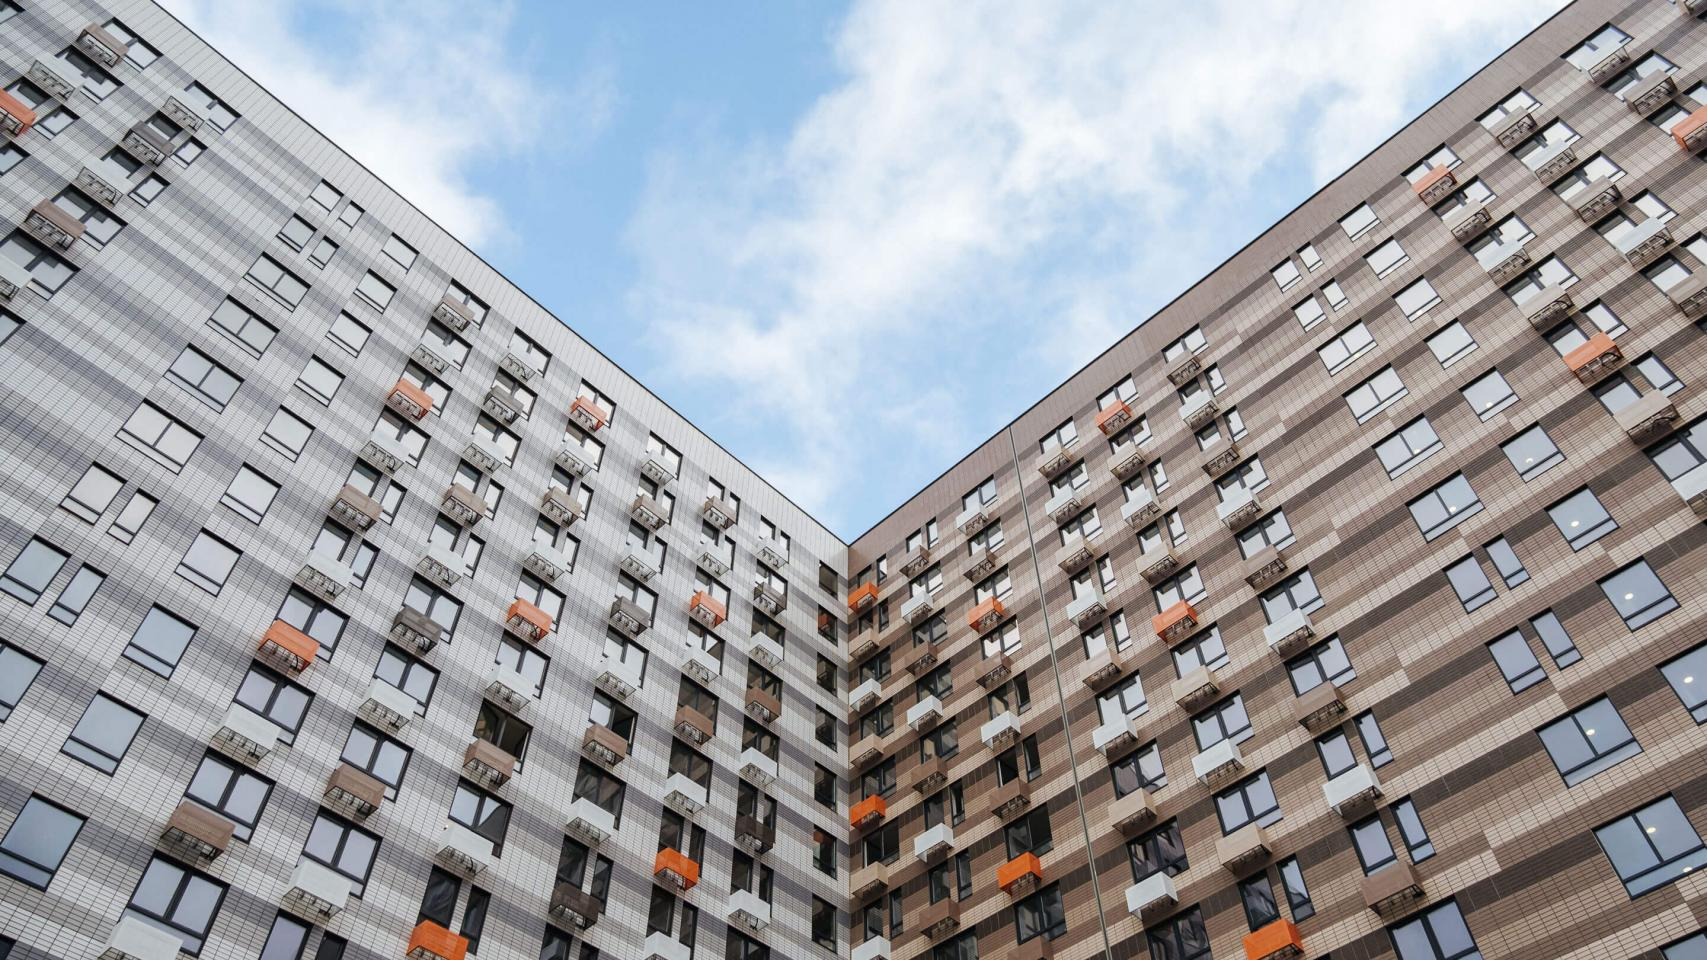 Стартовали продажи квартир вновом корпусе жилого района «Одинцово-1»